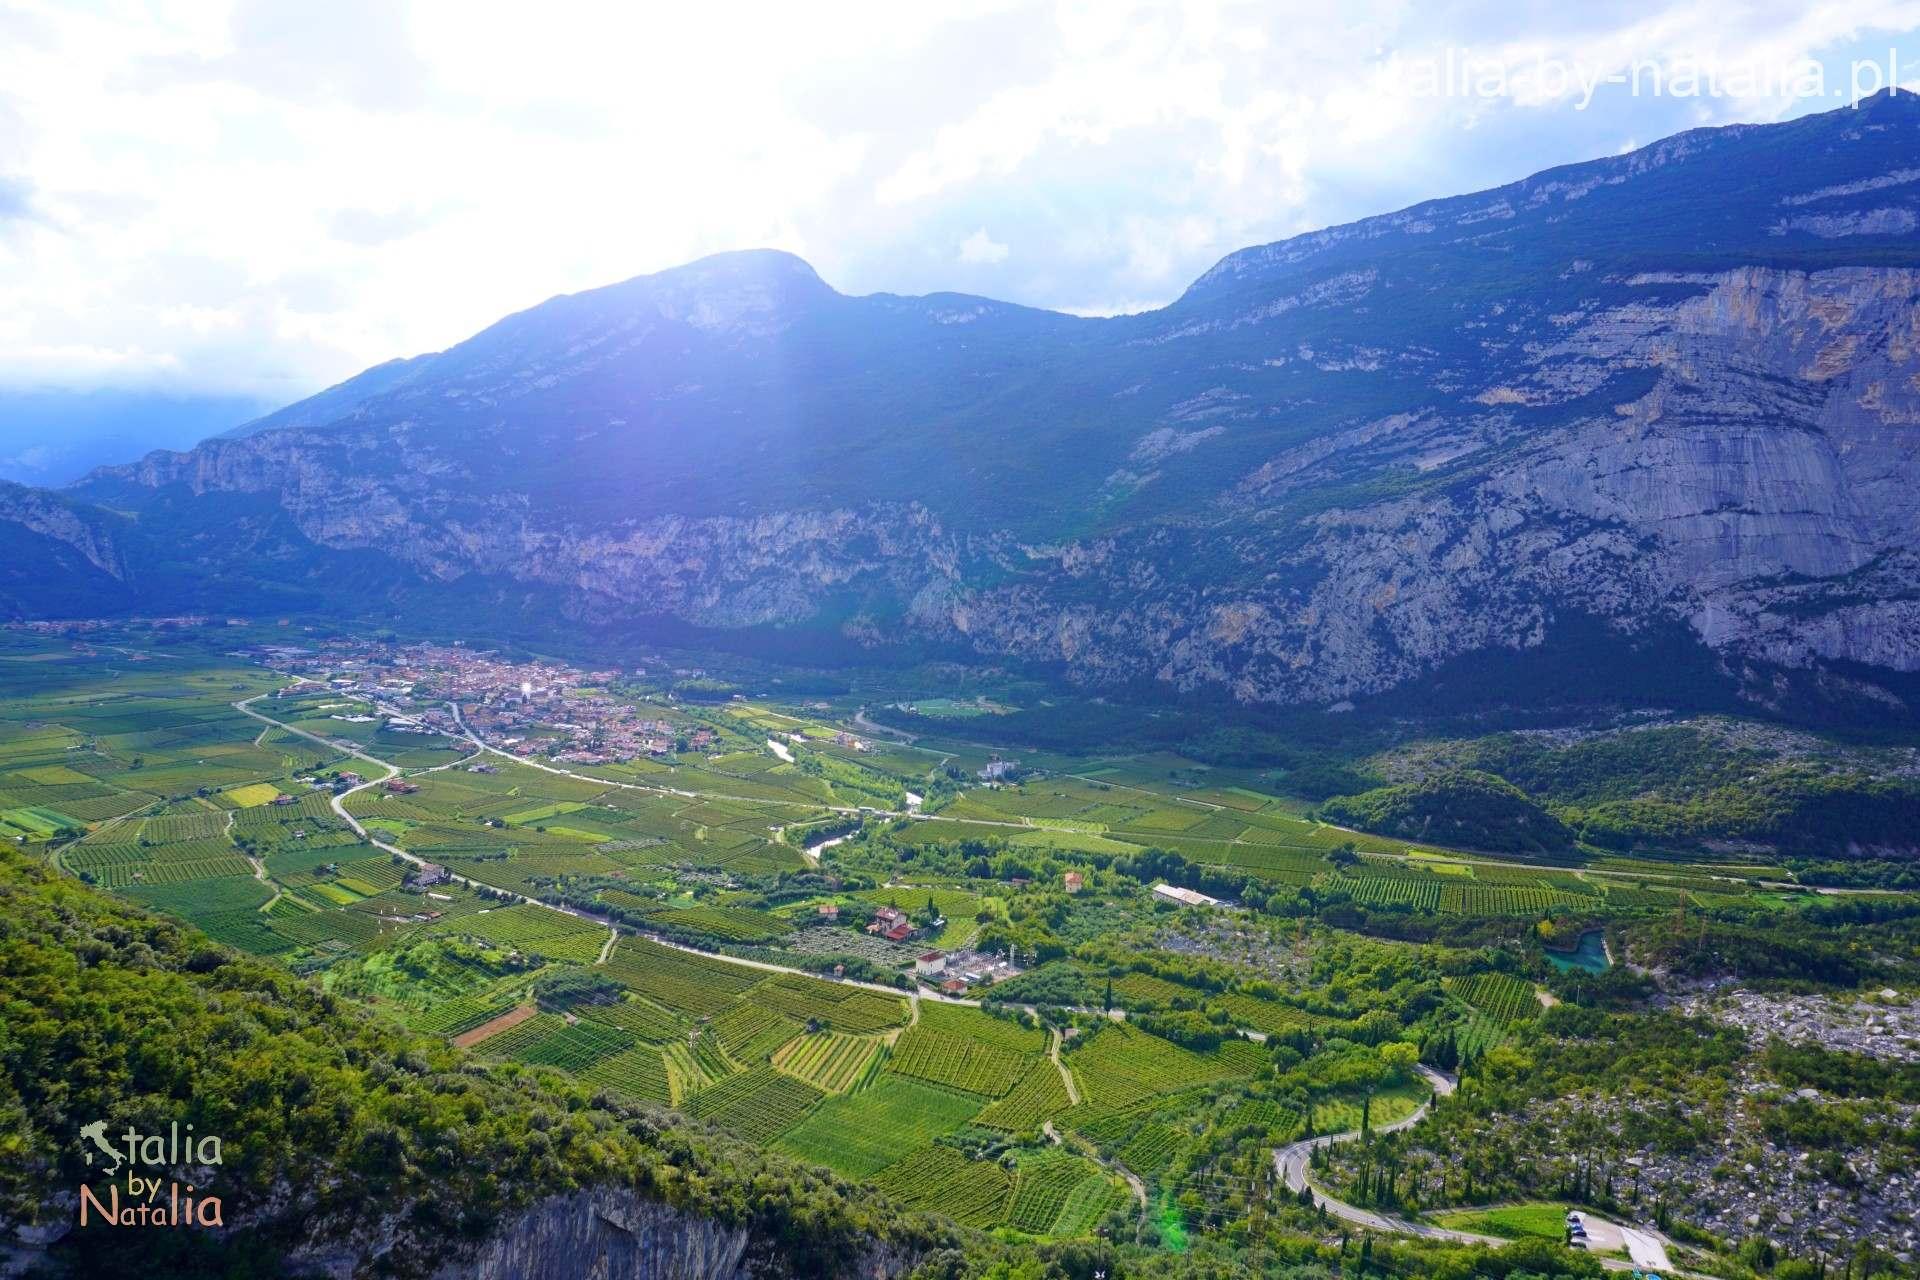 Dolina rzeki Sarca Garda Cavedine Arco Drena Toblino